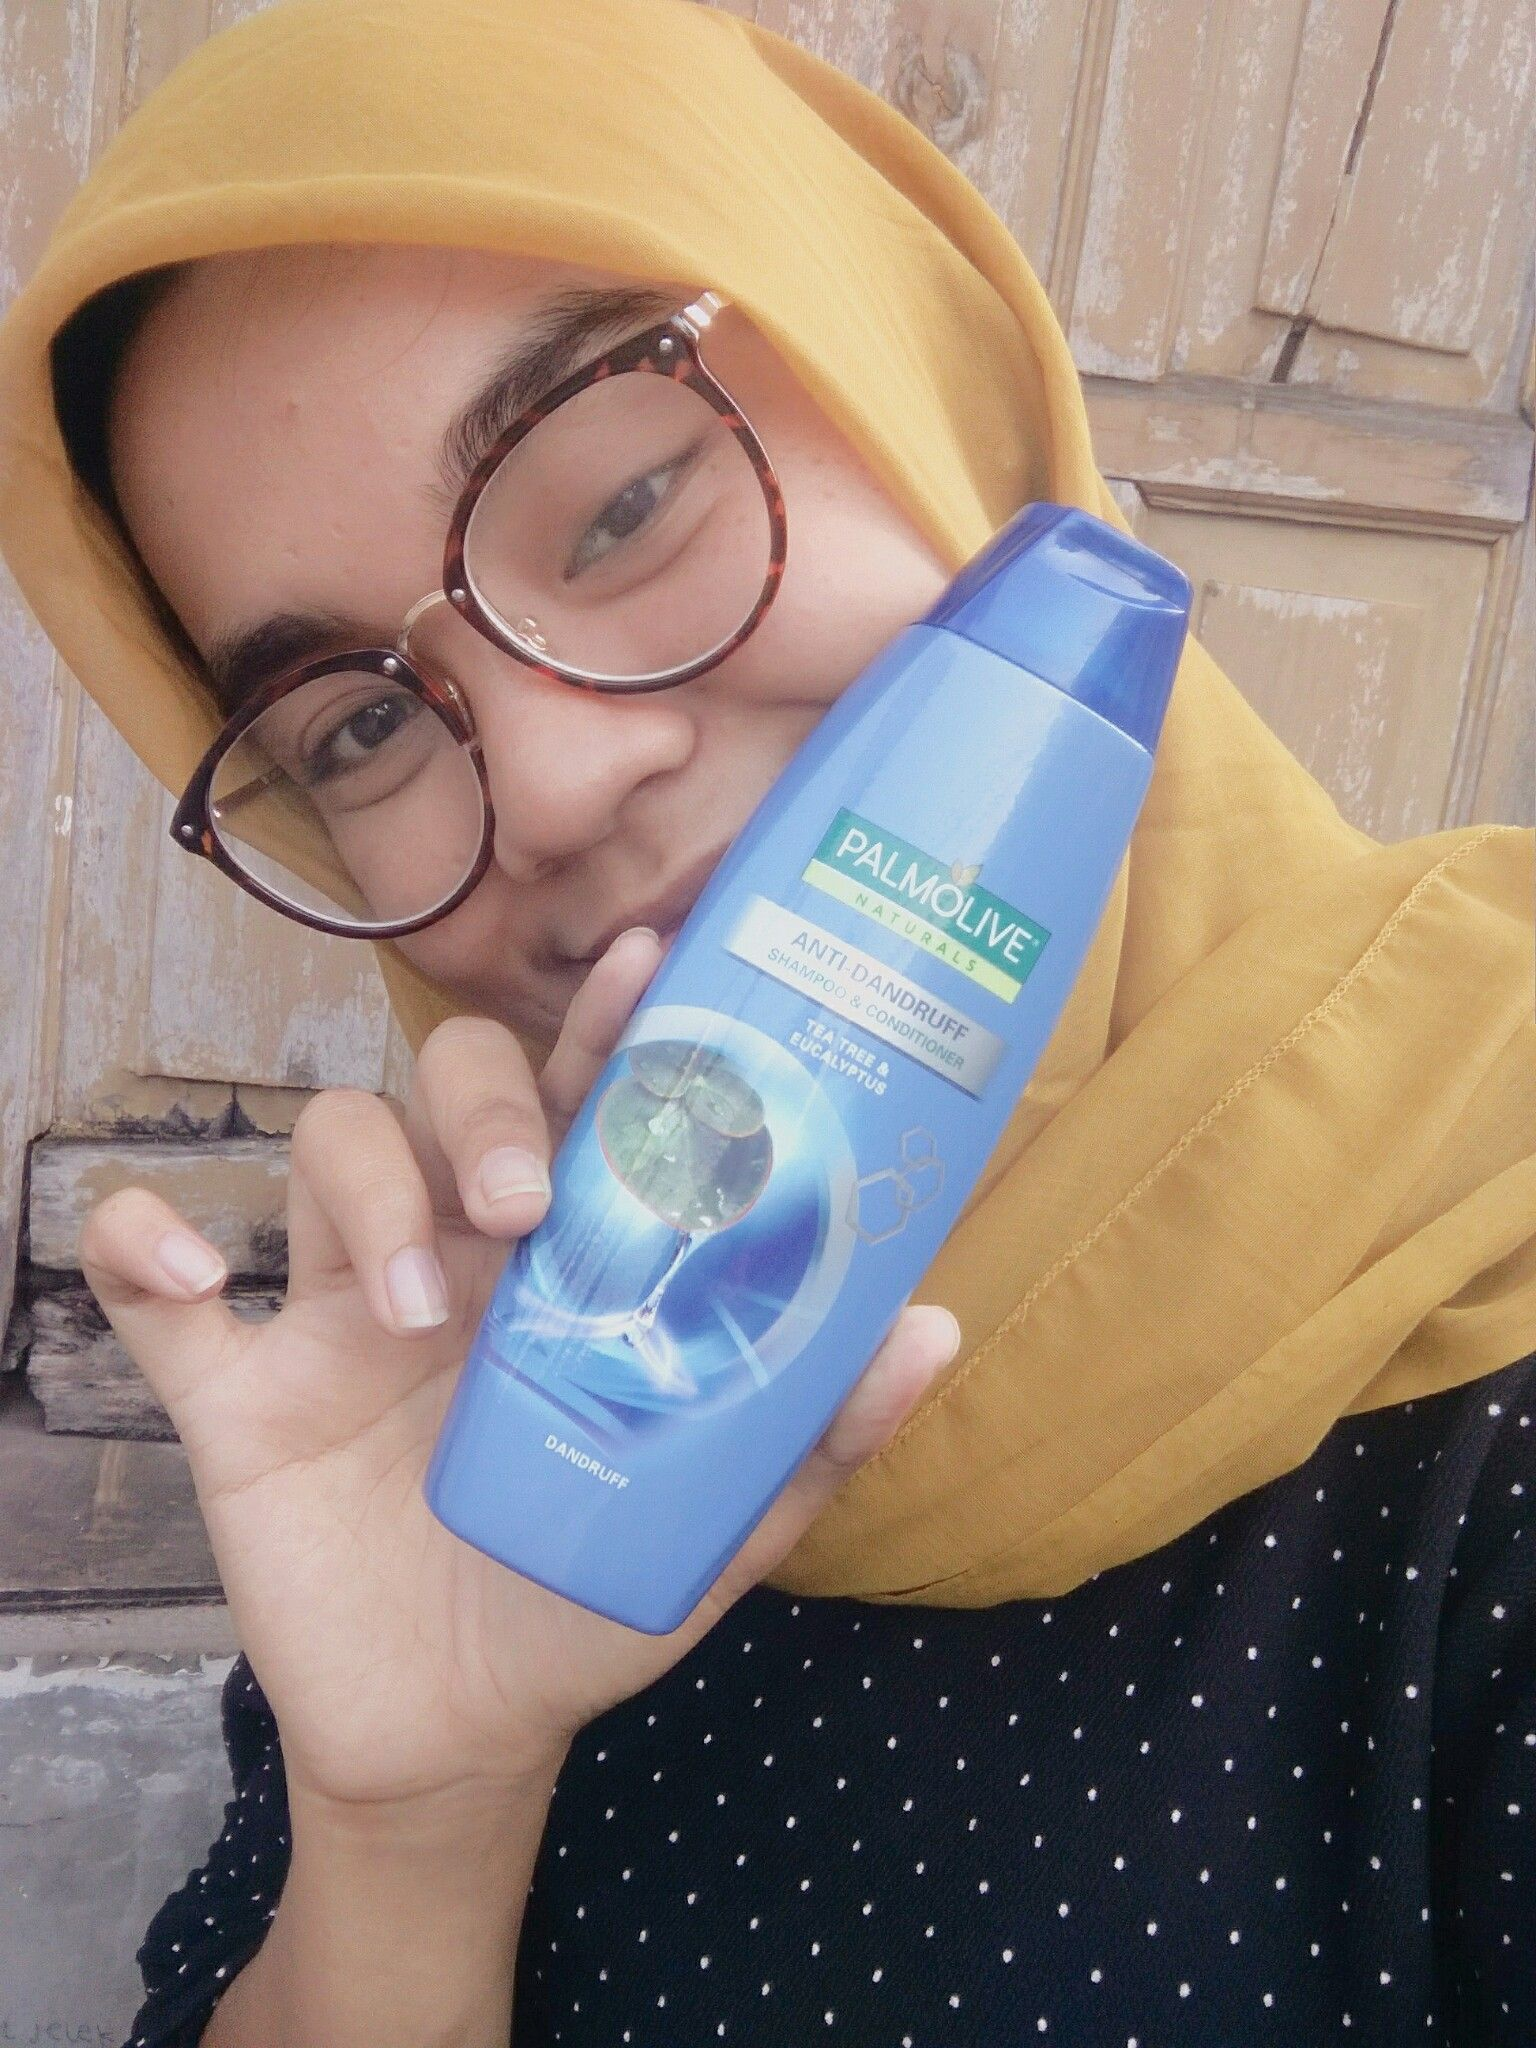 gambar review ke-1 untuk Palmolive Shampoo - Anti Dandruff